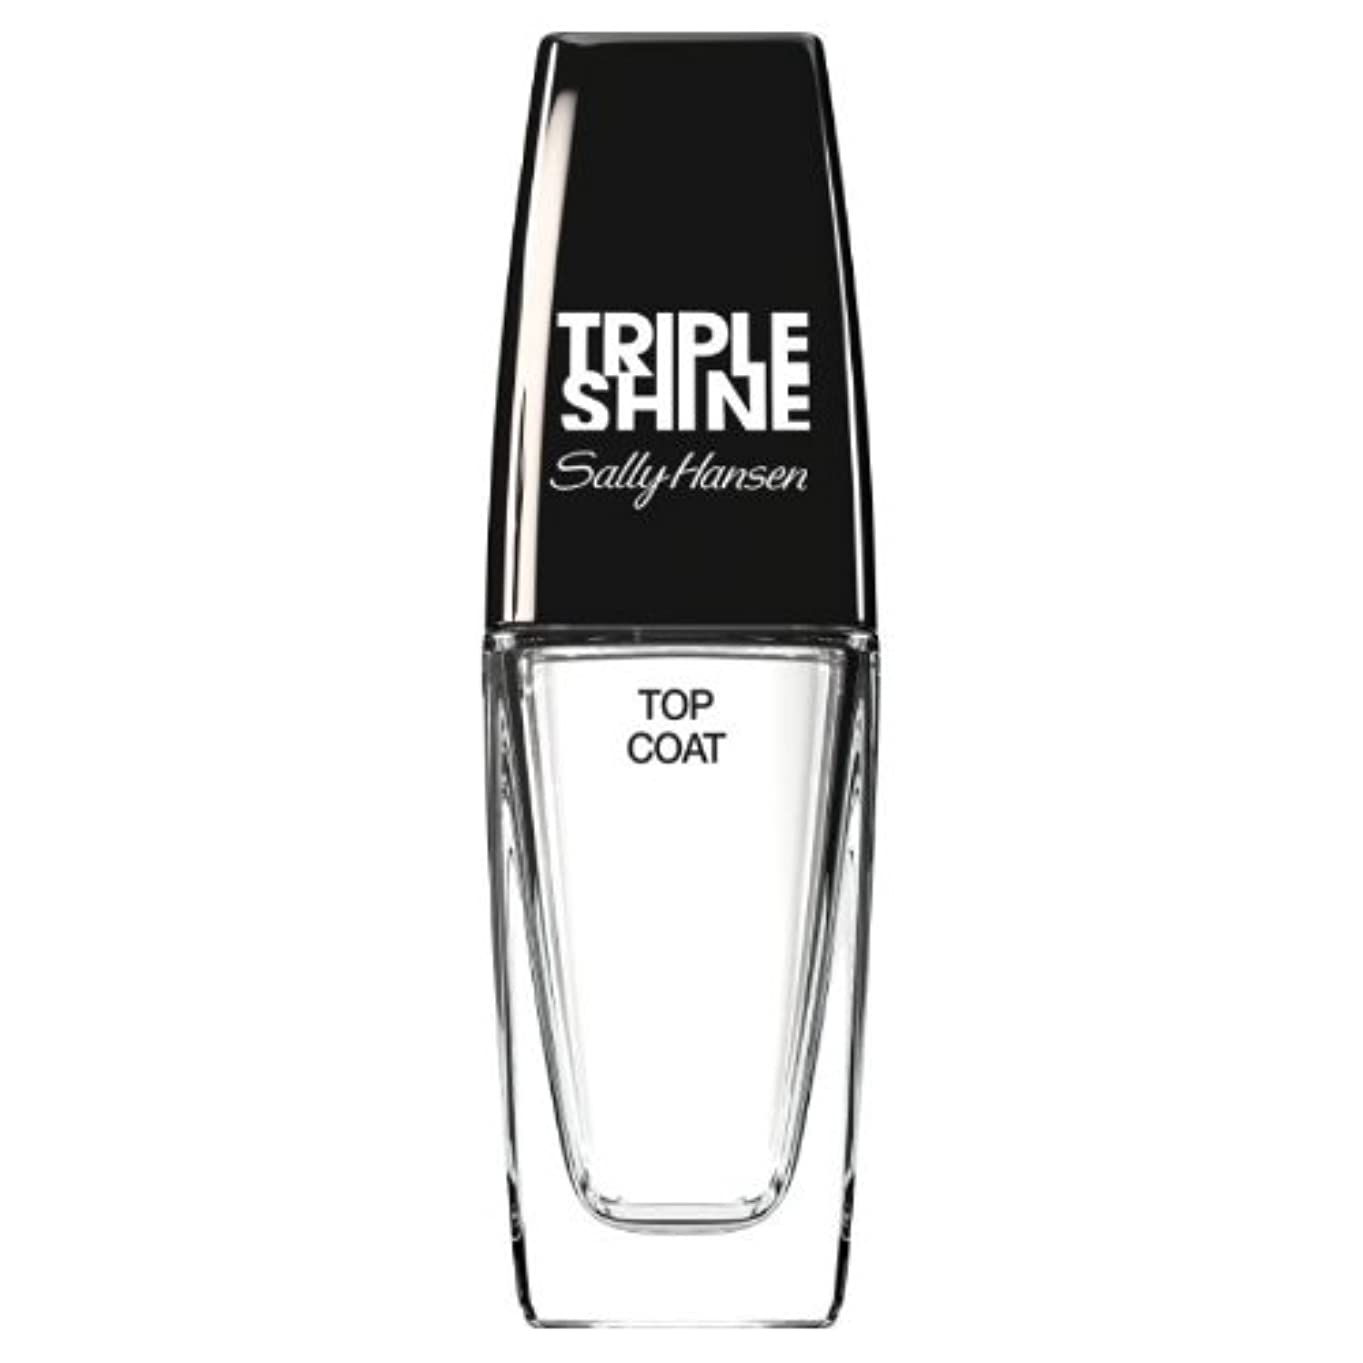 嵐が丘不従順廃止(3 Pack) SALLY HANSEN Triple Shine Top Coat - Triple Shine Top Coat (並行輸入品)